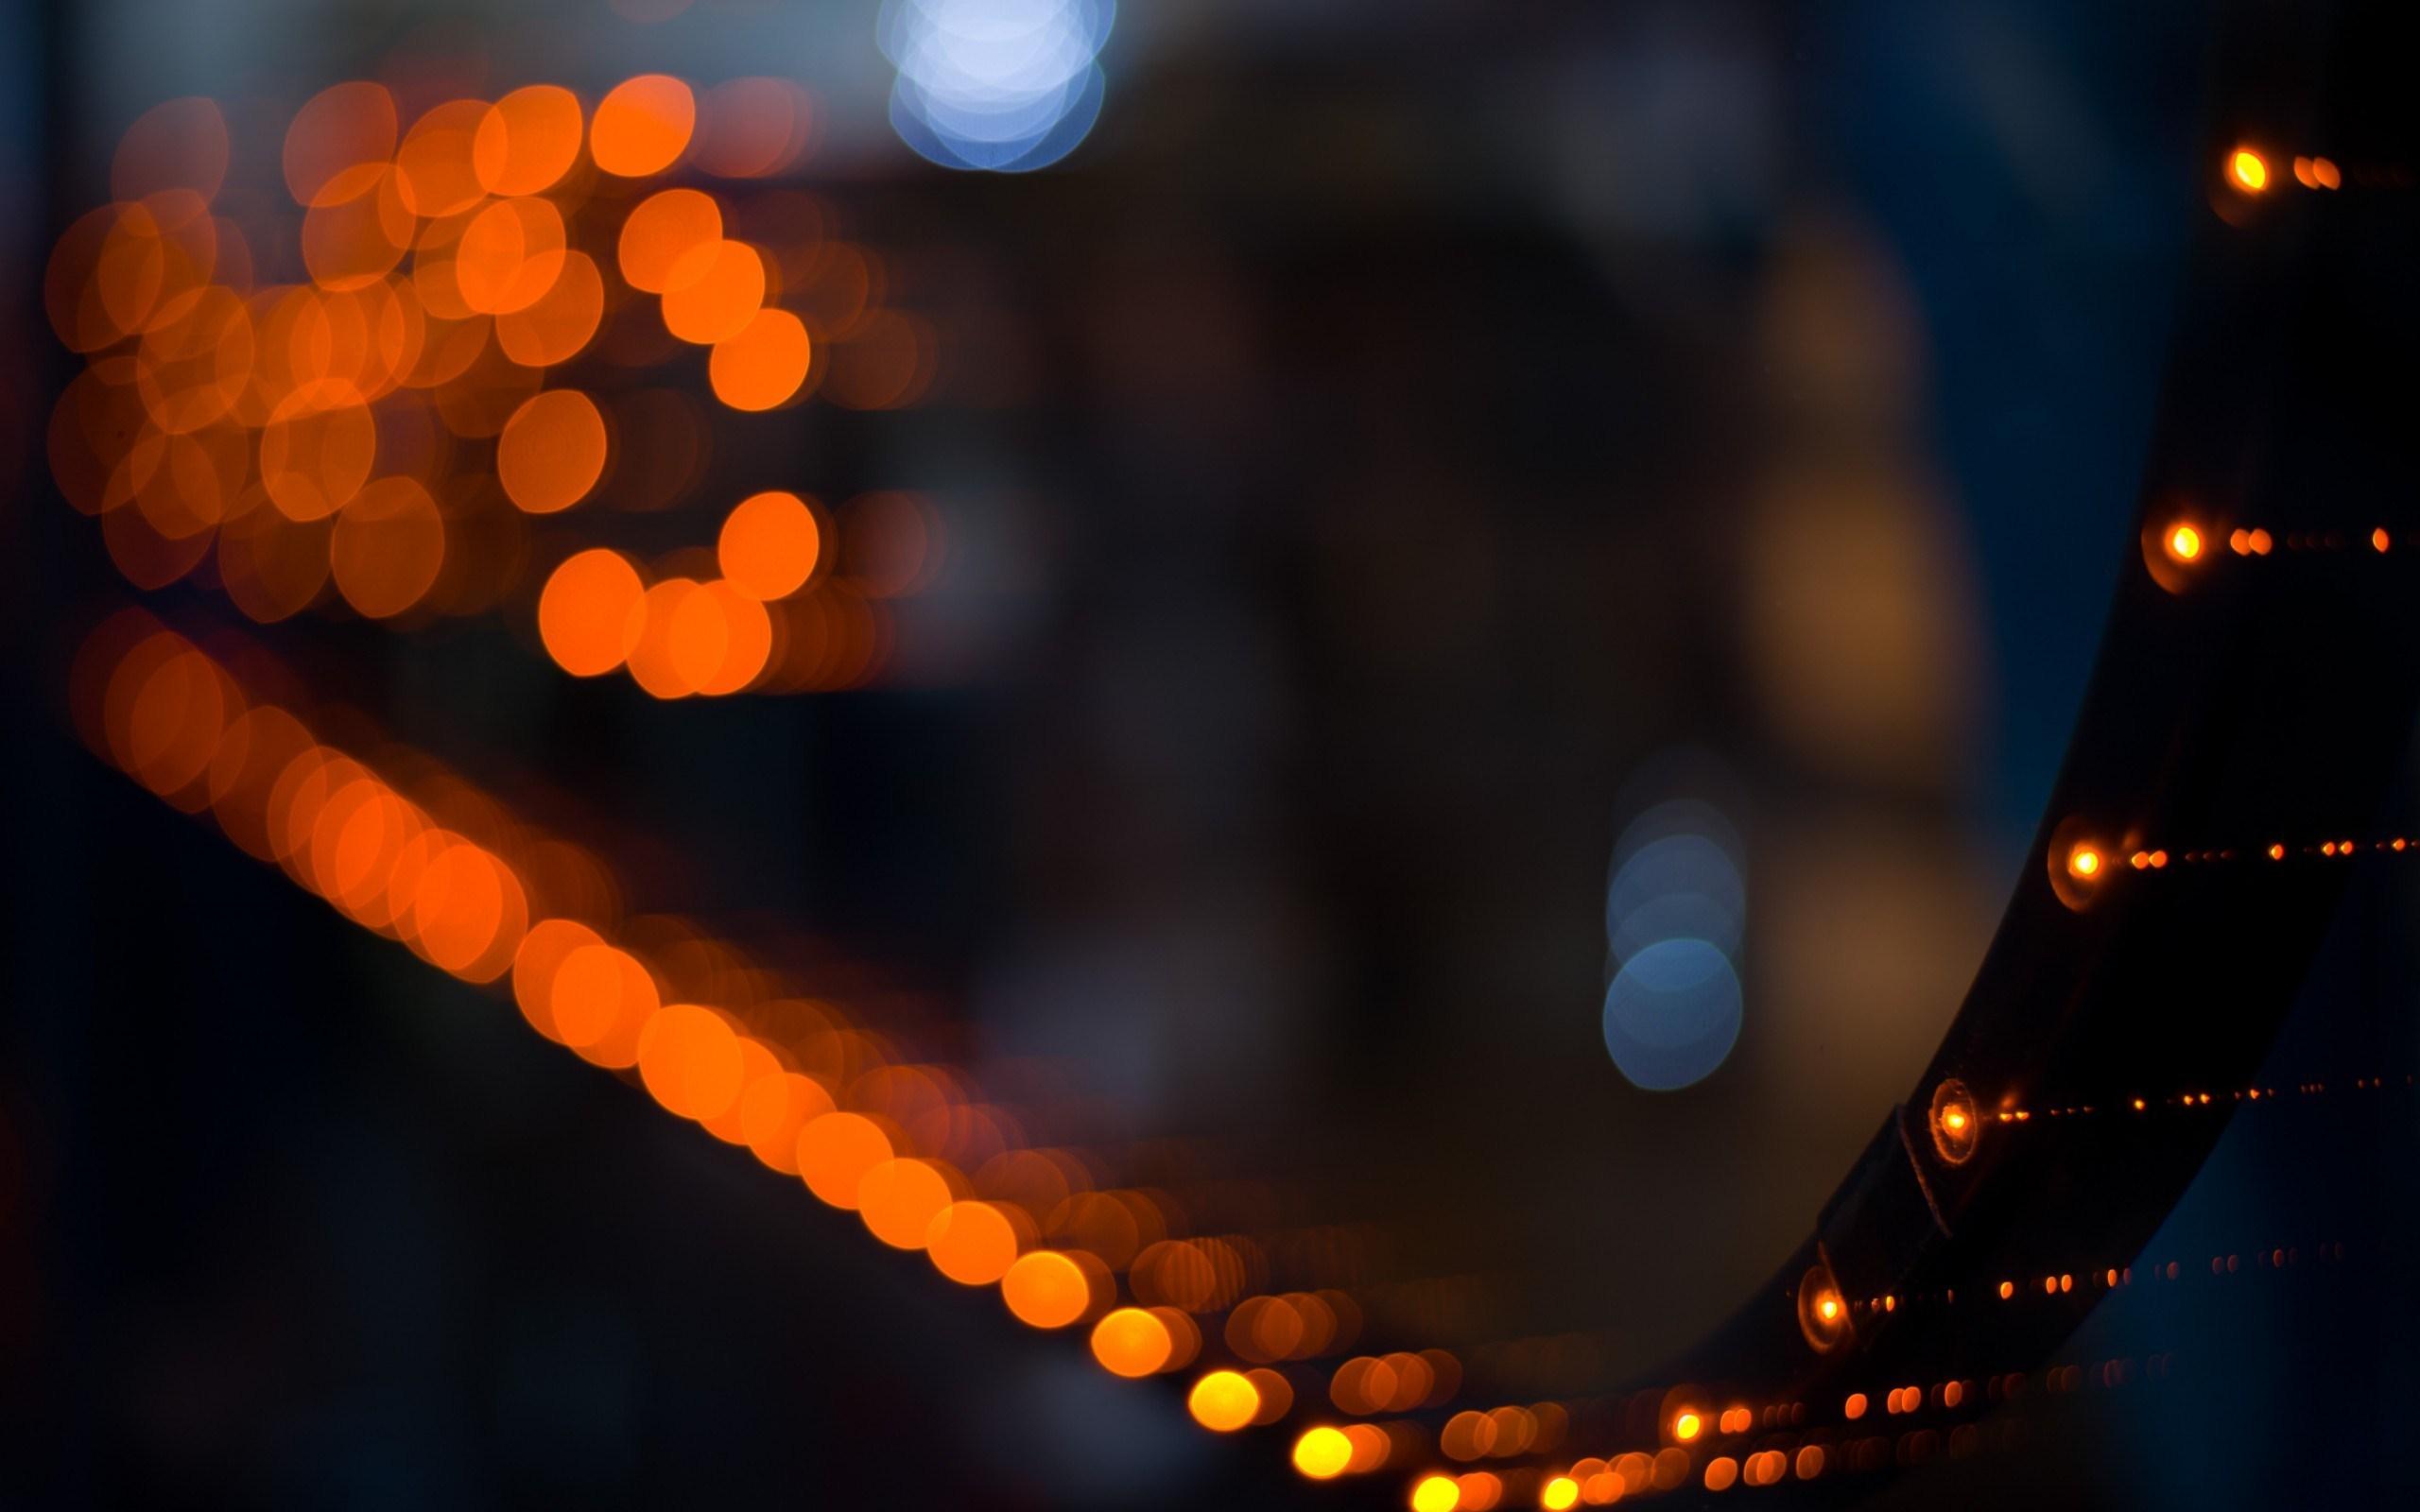 Lights Hd Wallpaper Background Image 2560x1600 Id